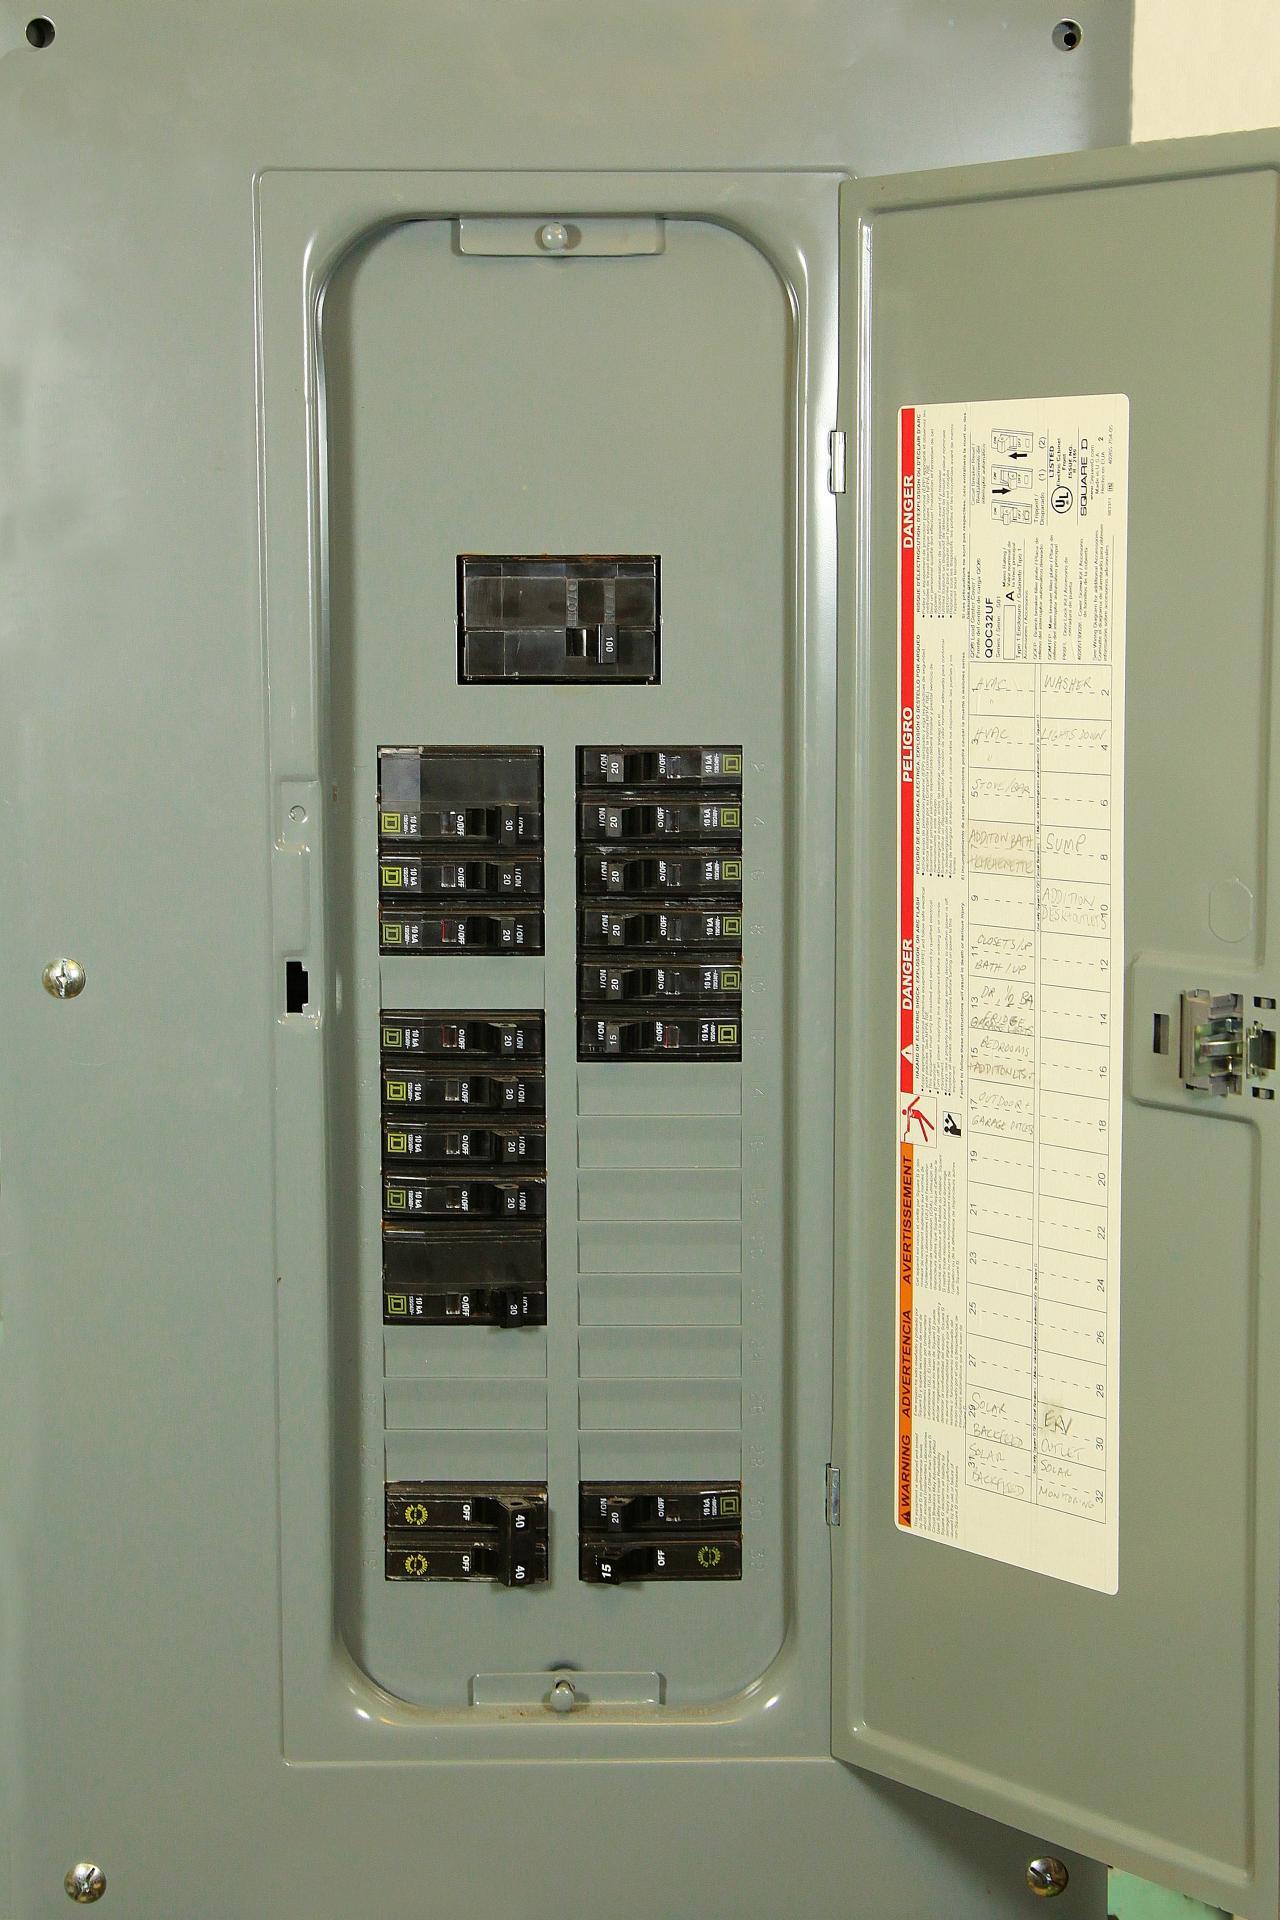 RL_8704] Control Panel Wiring ExamplesAlma Vira Mohammedshrine Librar Wiring 101